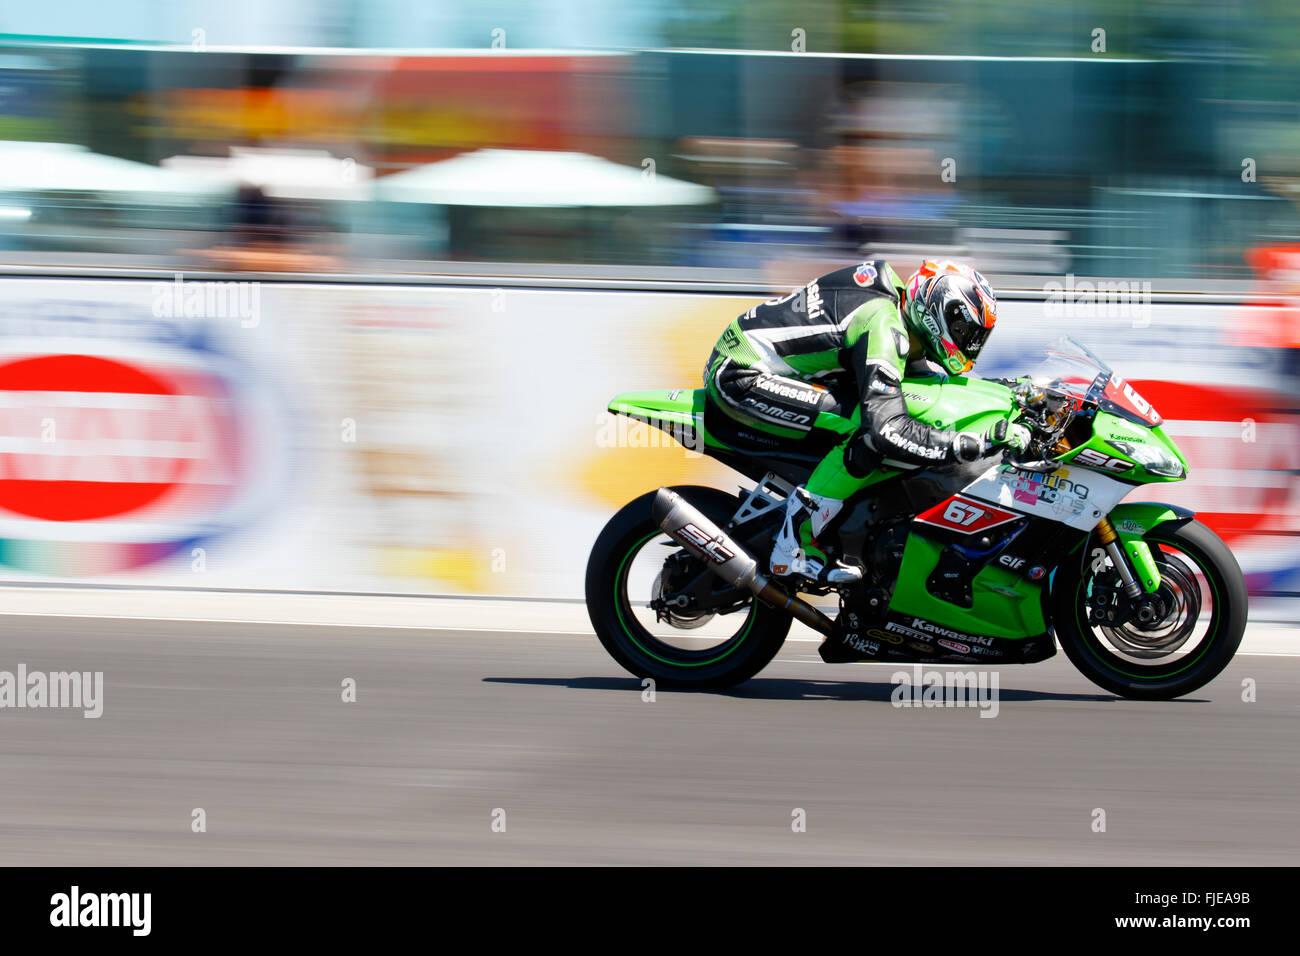 Misano Adriatico, Italy - June 21, 2015: Kawasaki ZX-10R of Team Pedercini, driven by STARING Bryan Stock Photo